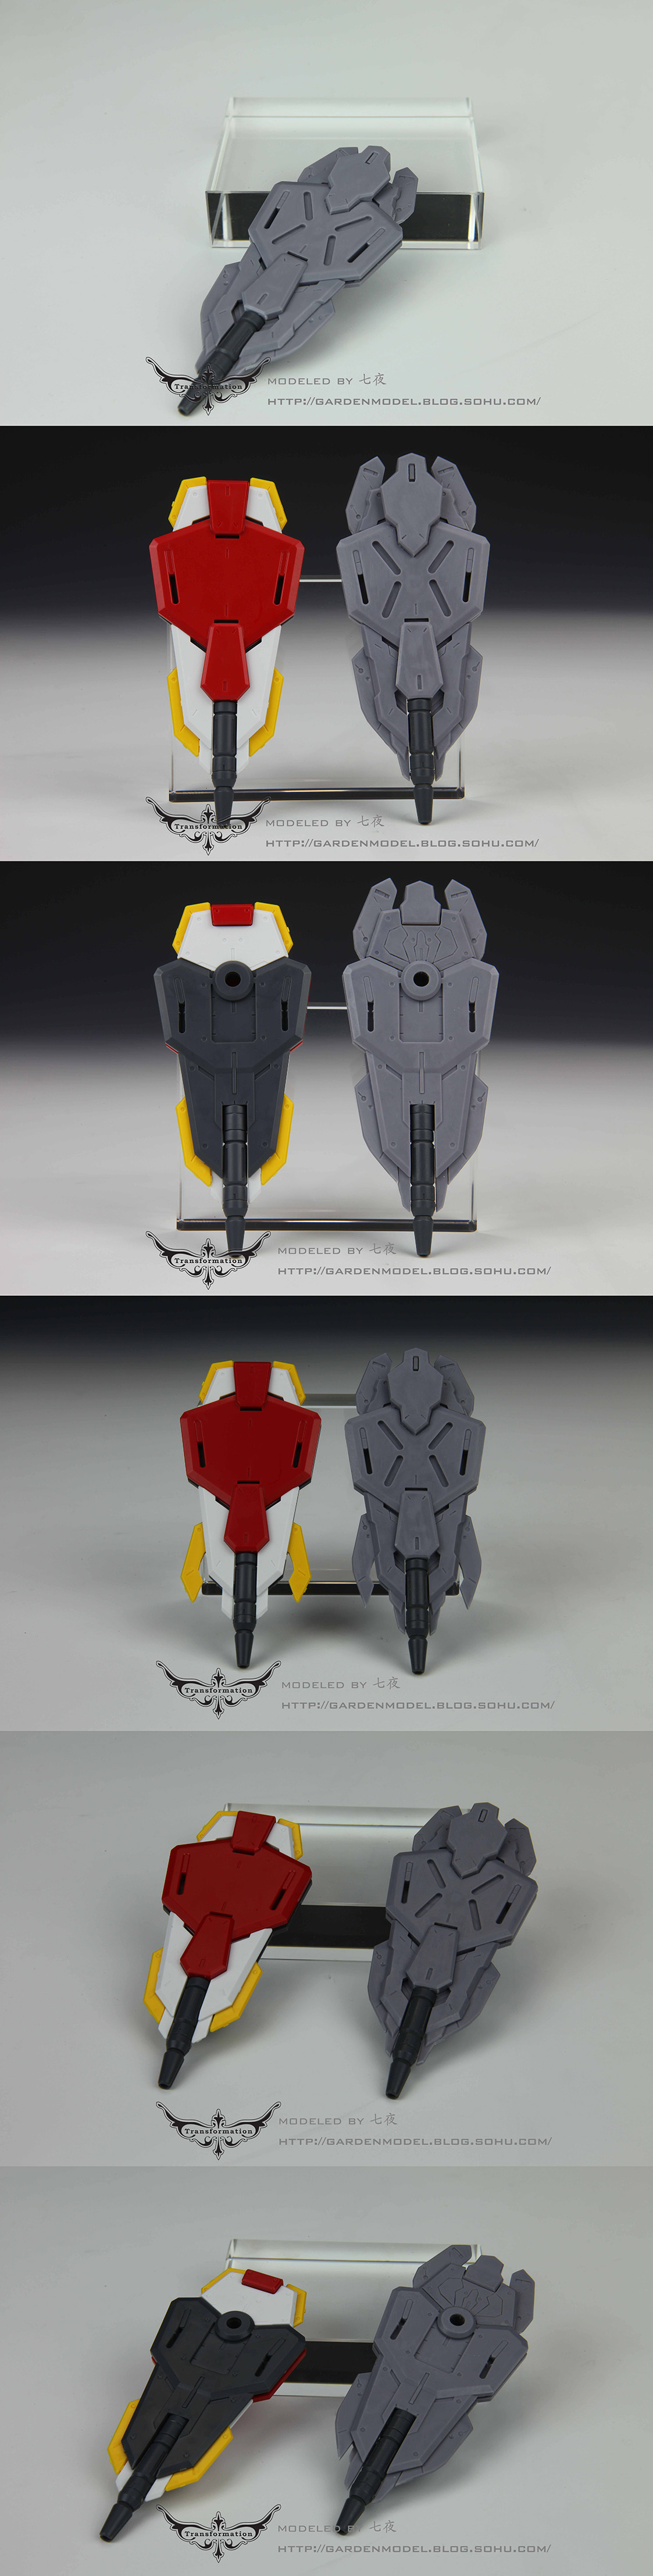 G93-buildstrike-tm-info-inask-016.jpg